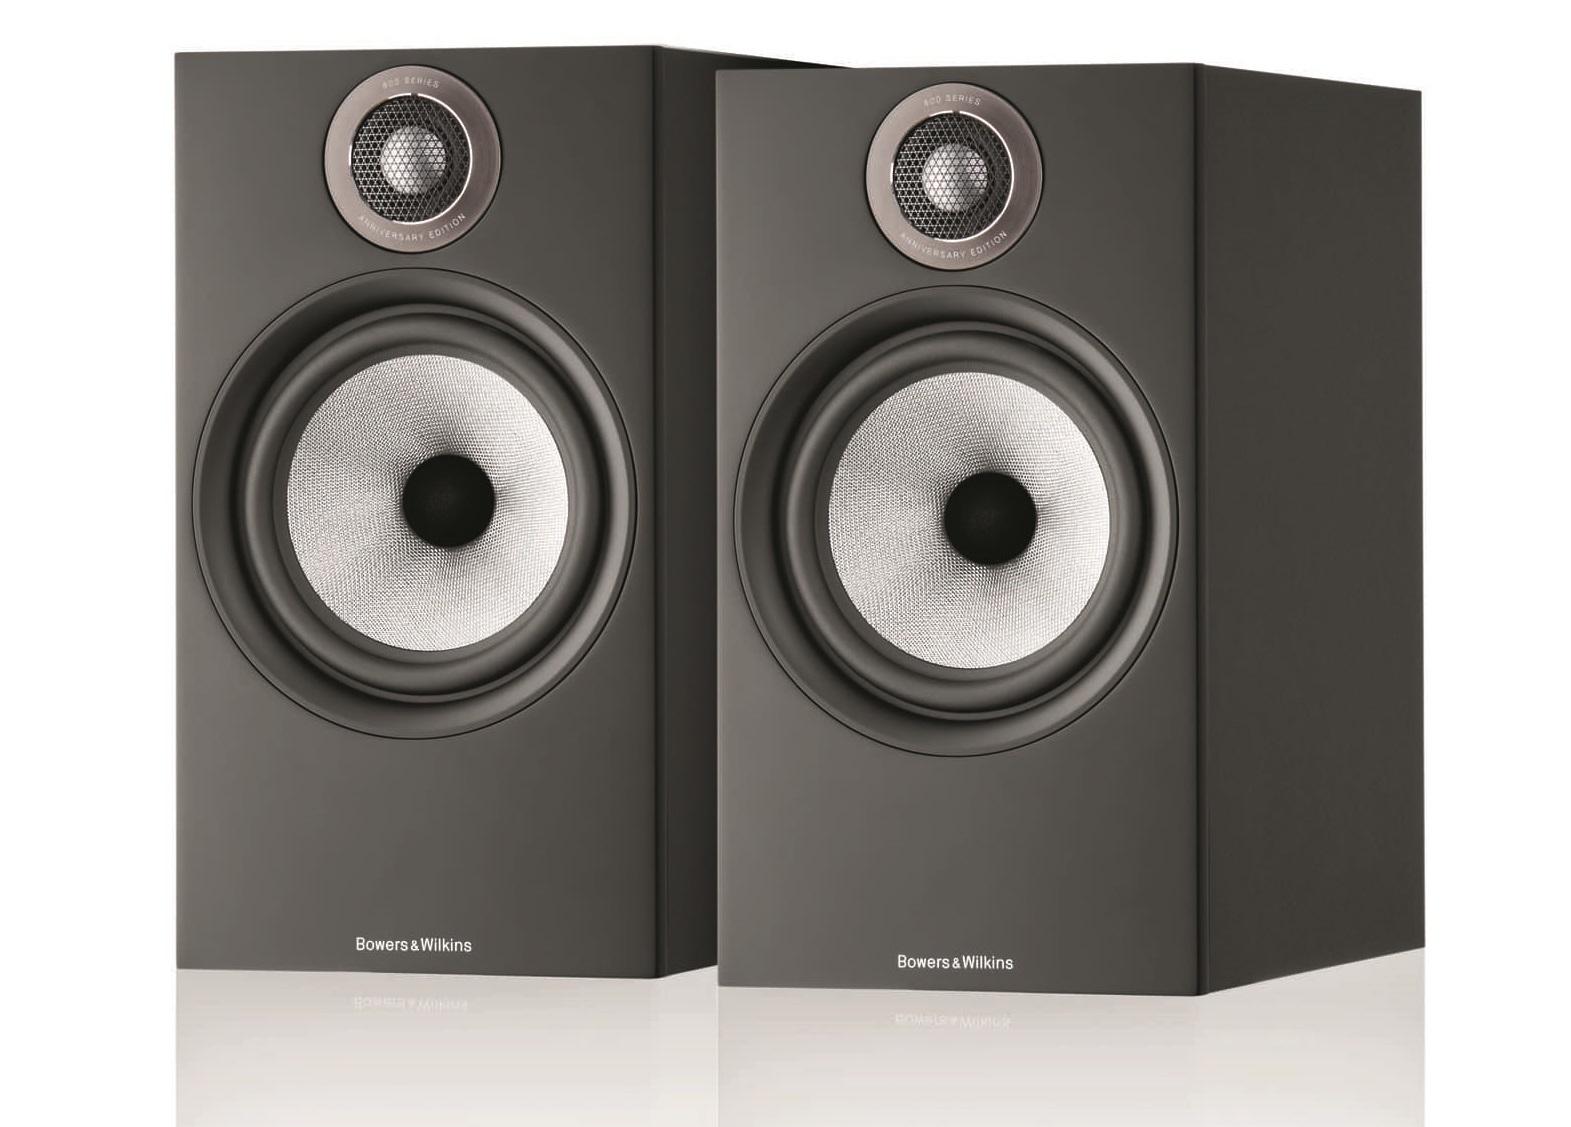 Полочная акустика B&W 606 S2 Anniversary Edition matte black